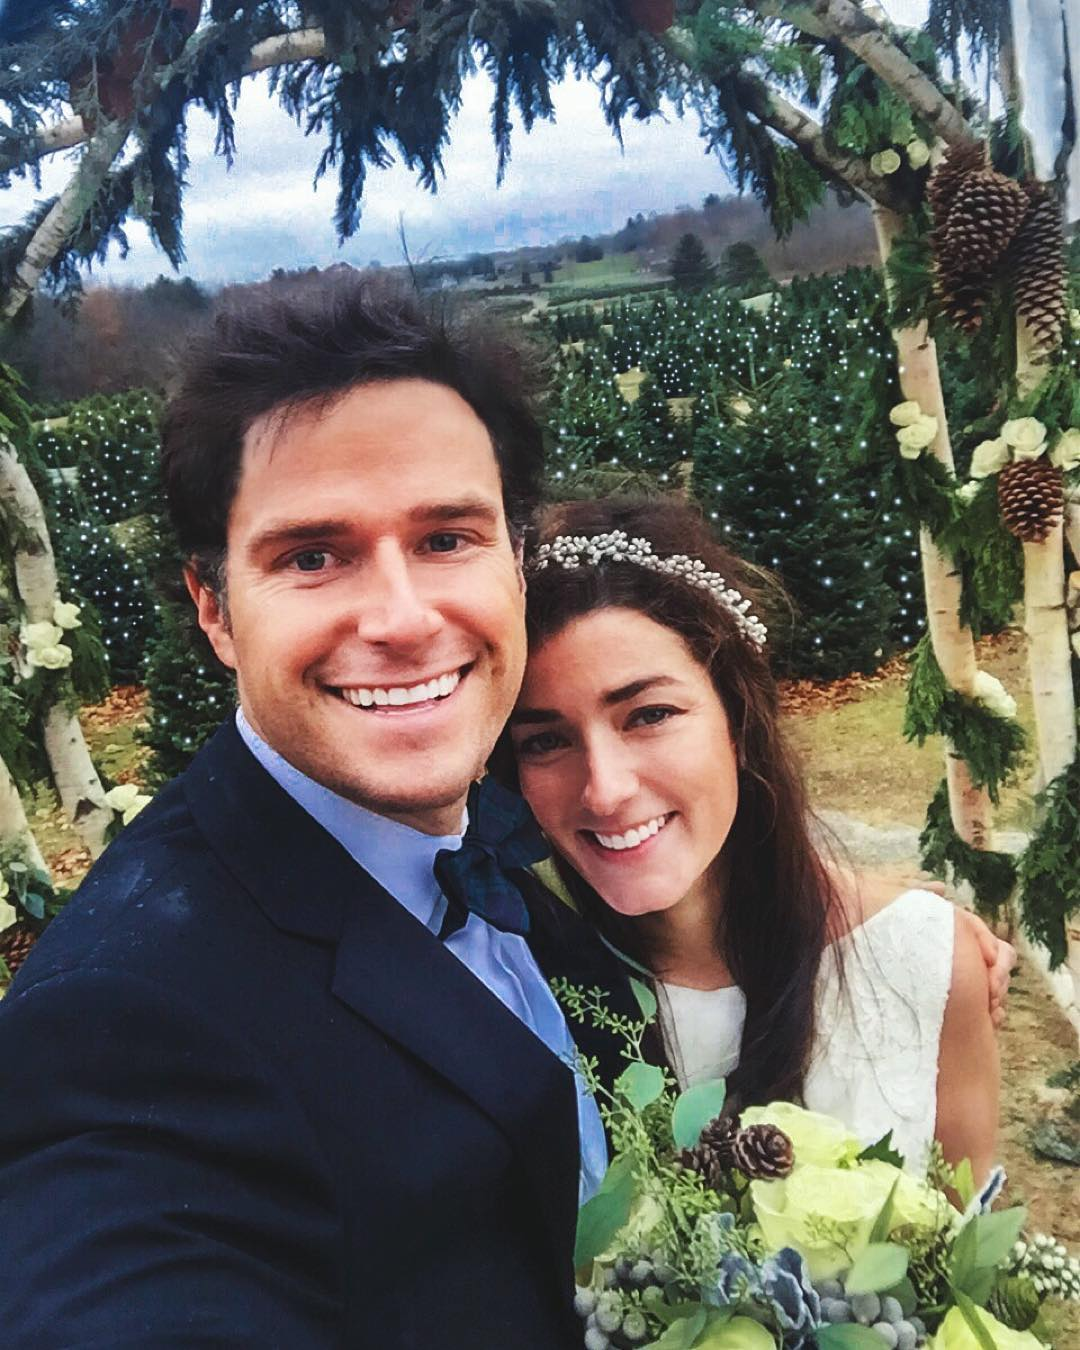 christmas-tree-farm-wedding-sarah-vickers-kiel-patrick-50